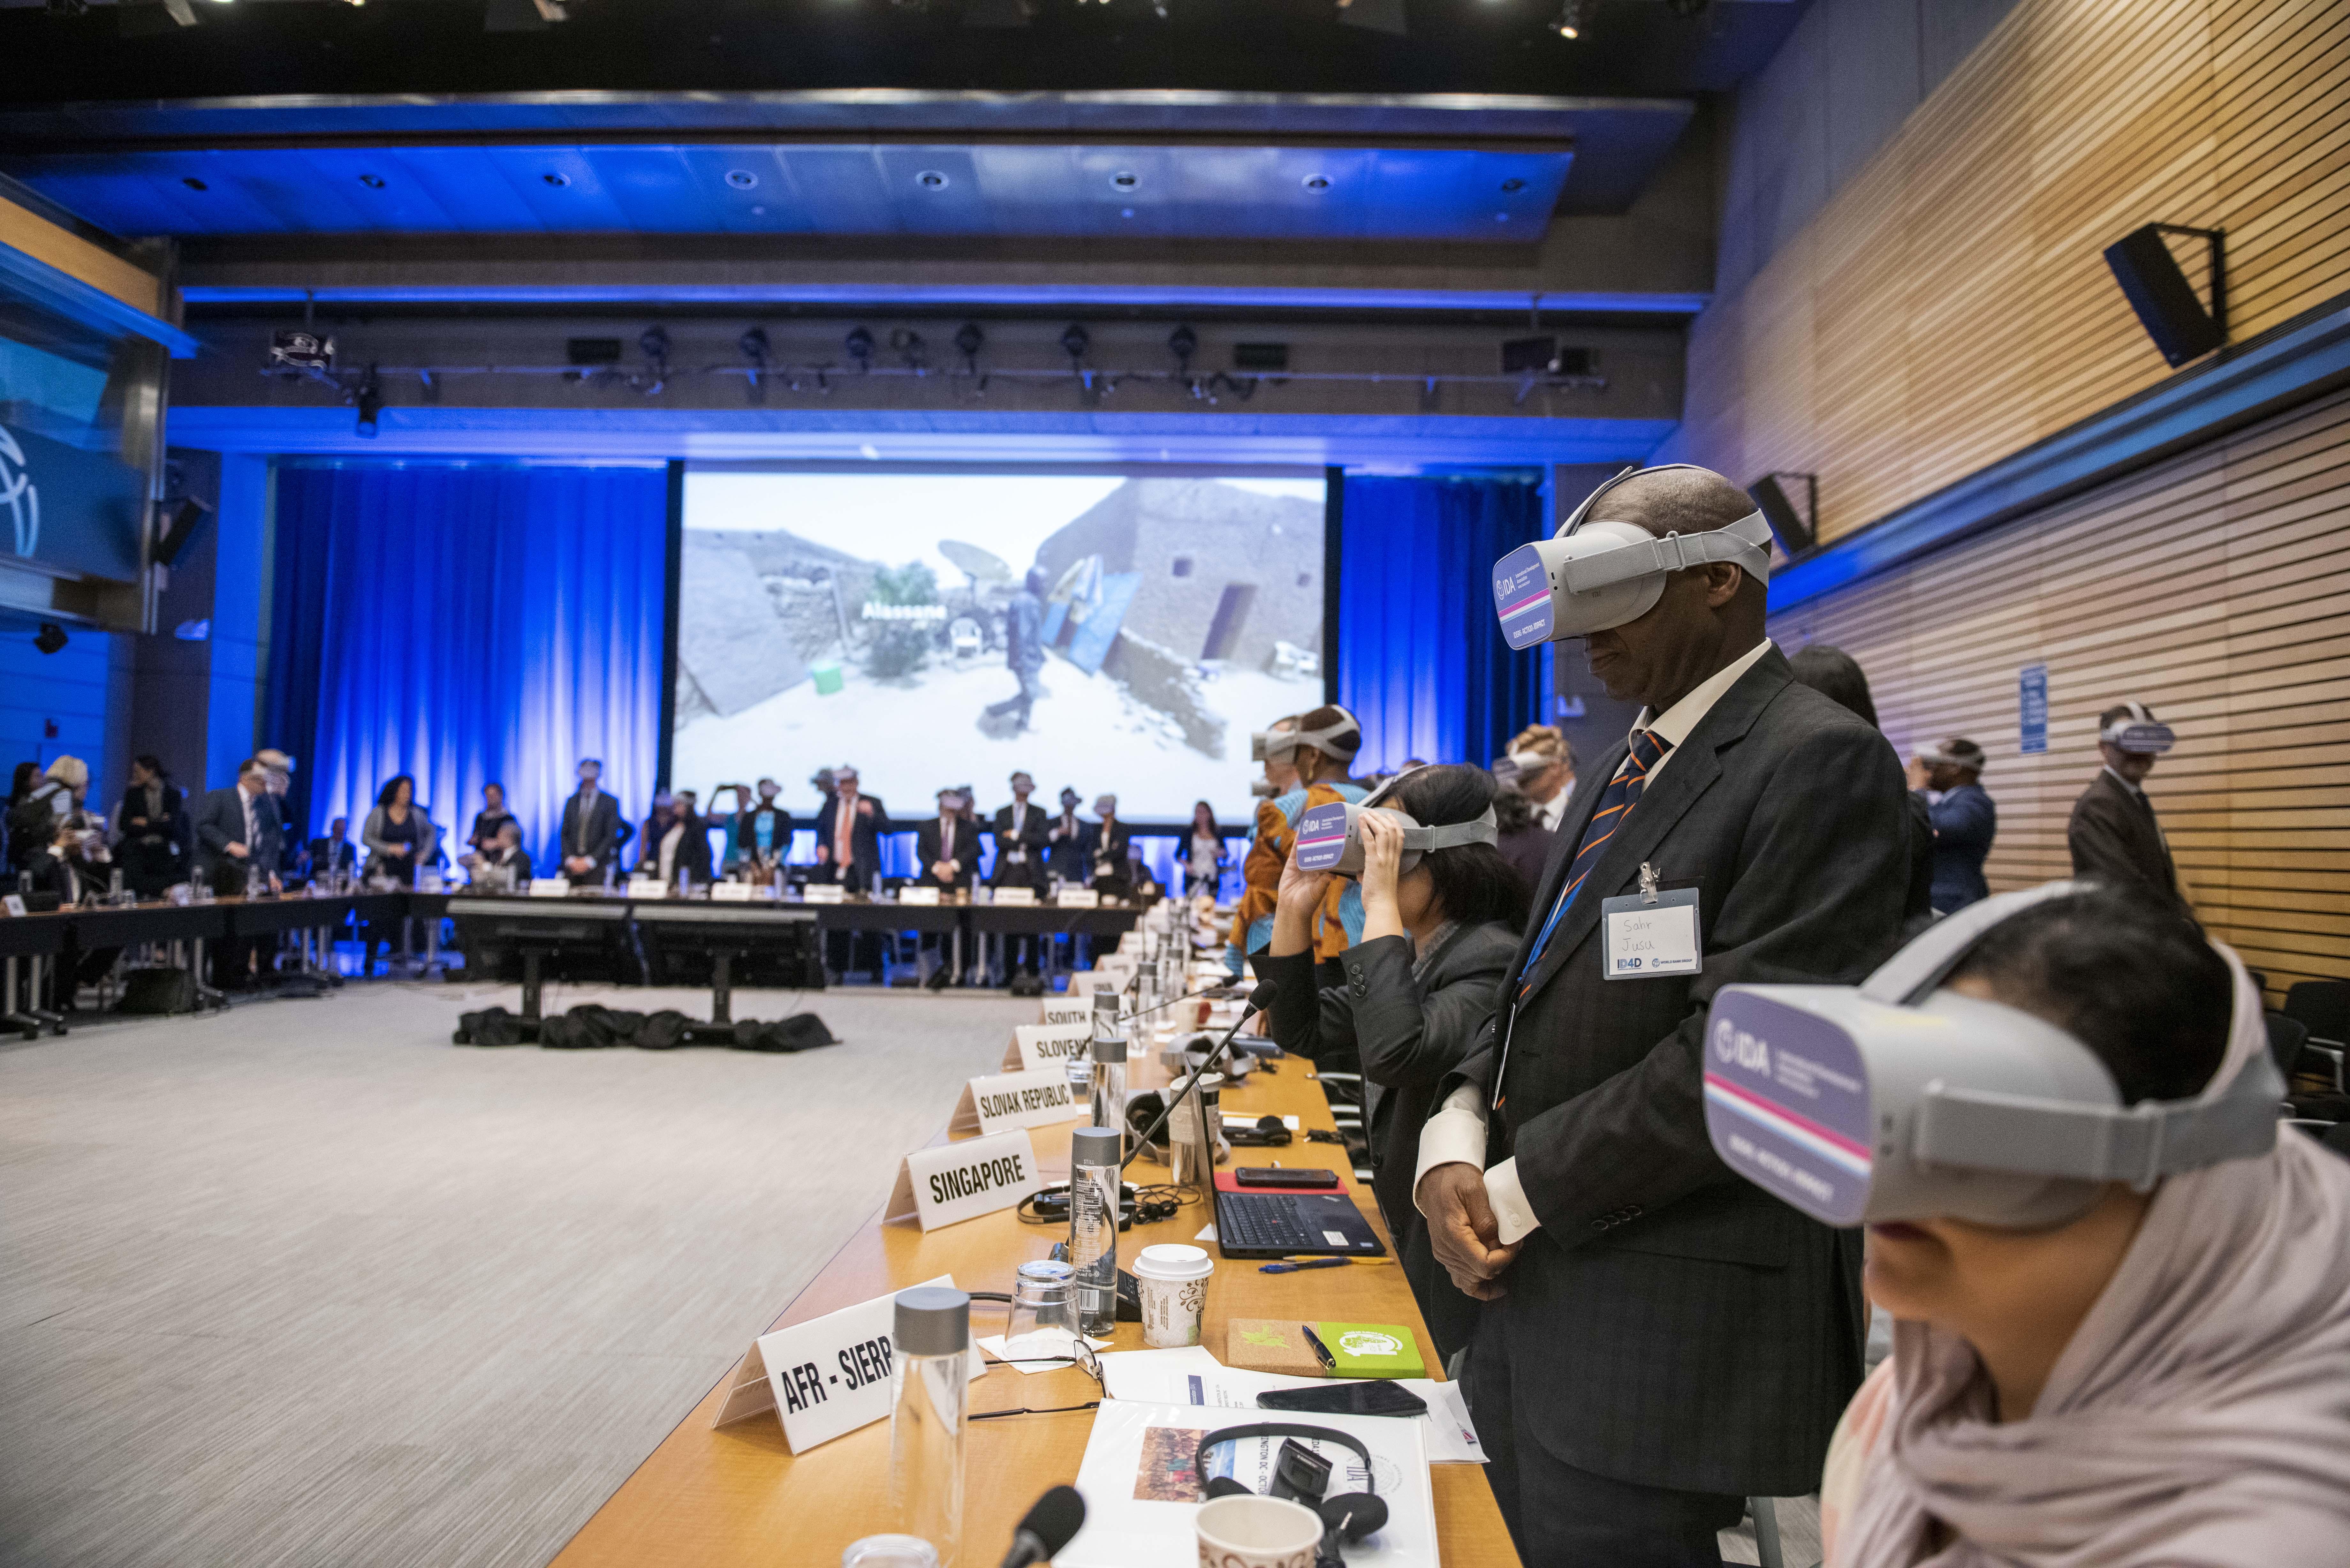 VR film screening at World Bank